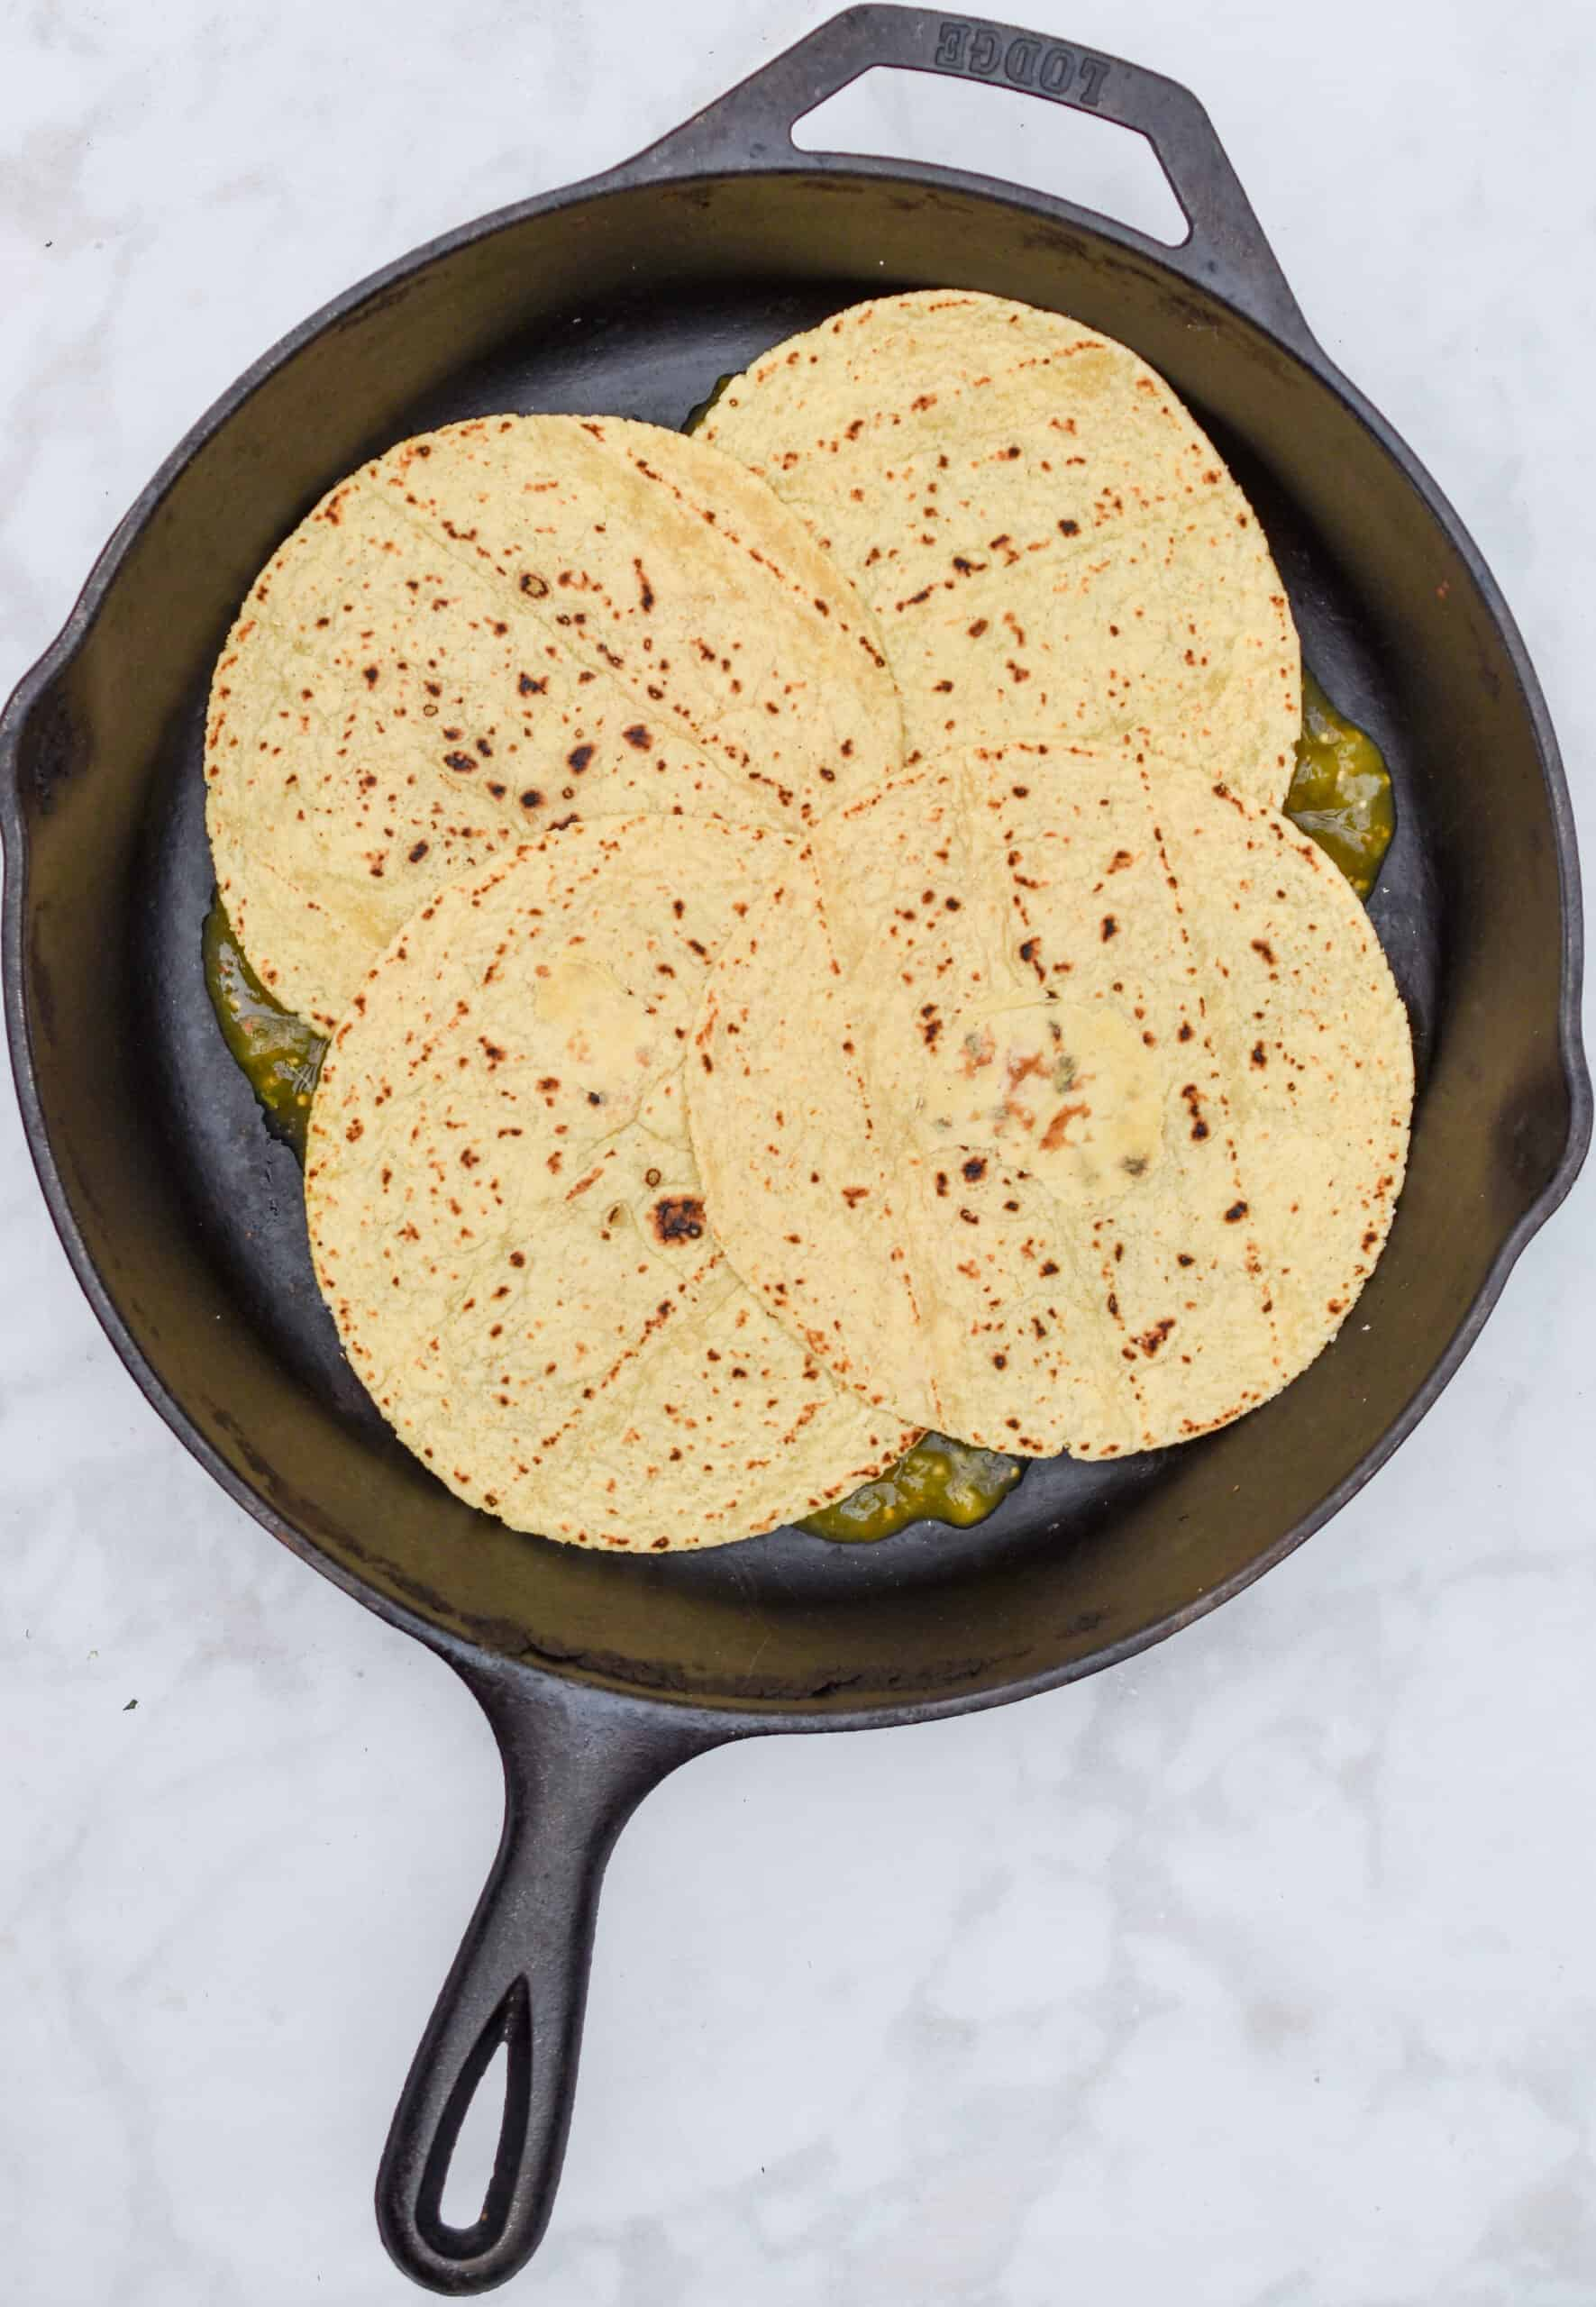 Add corn tortillas